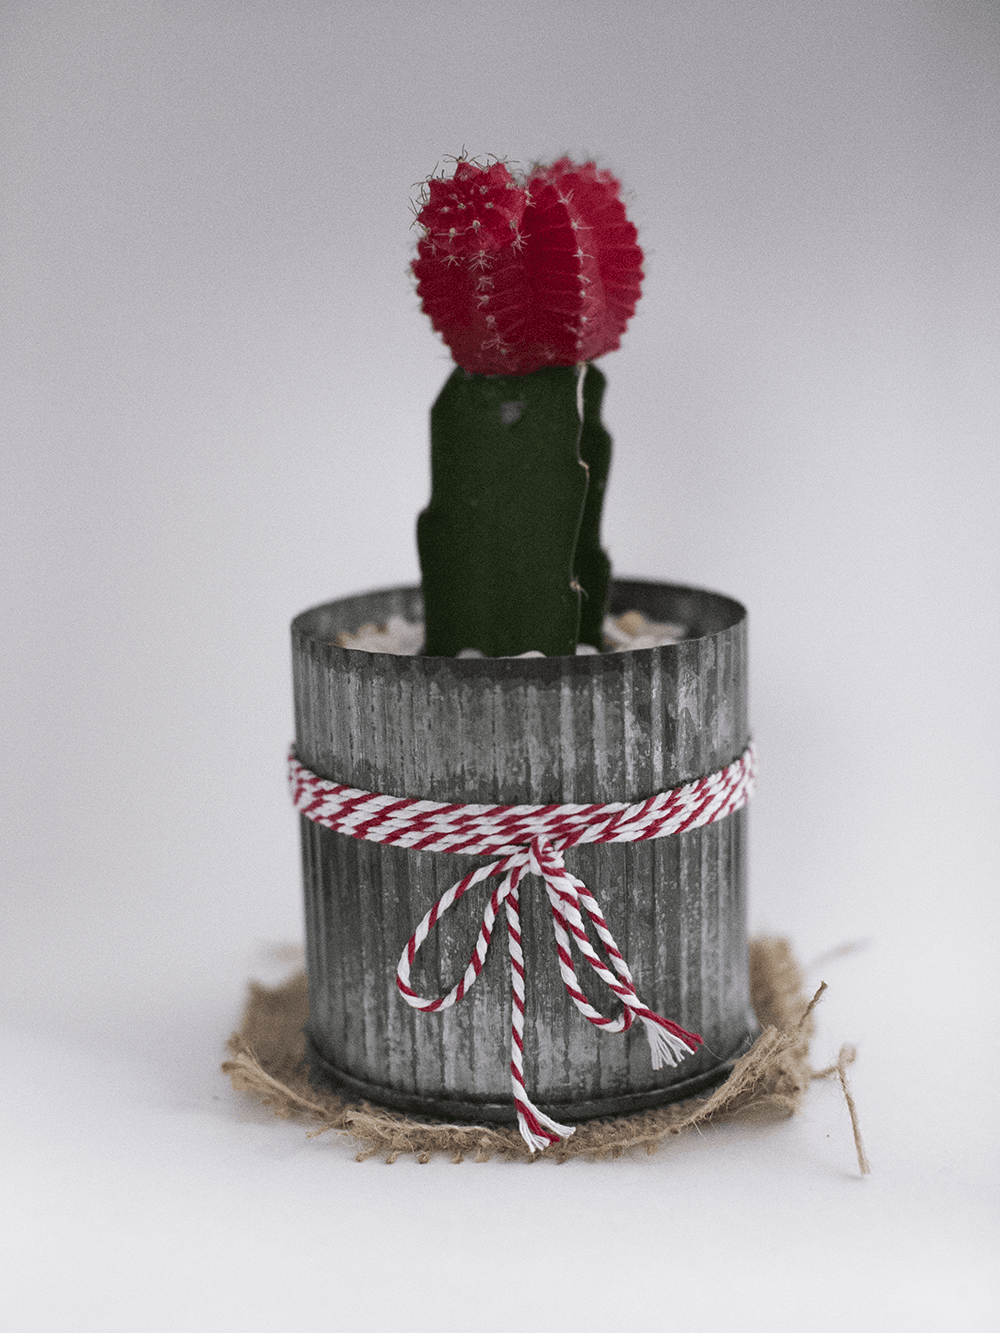 Cactus photo with Canon